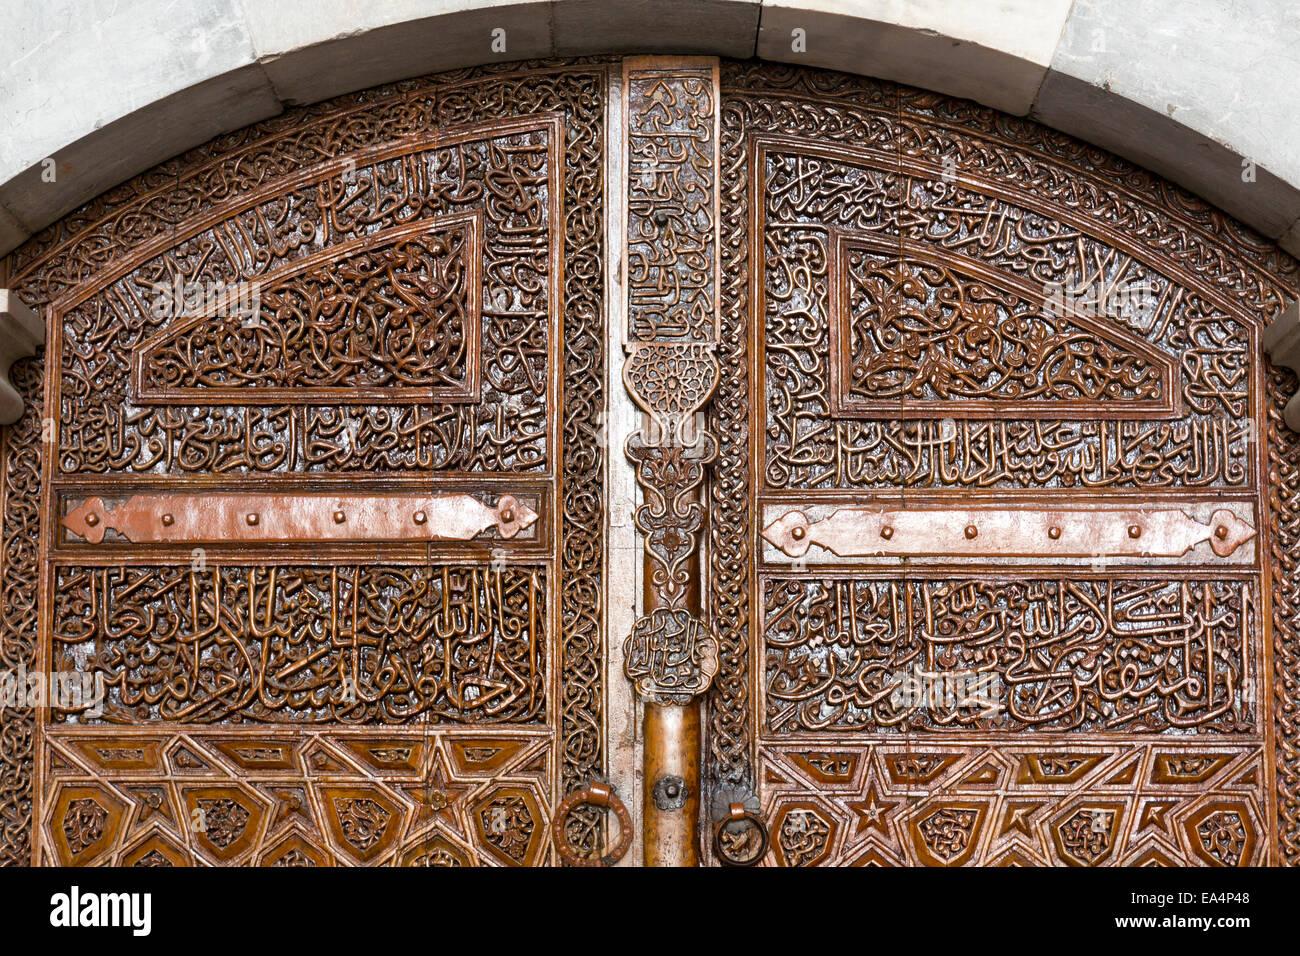 Detail Of Door Of Bayezid Pasha Mosque Amasya Turkey - Stock Image & Islamic Doorways u0026 Islamic Wooden Door - Stock Image pezcame.com